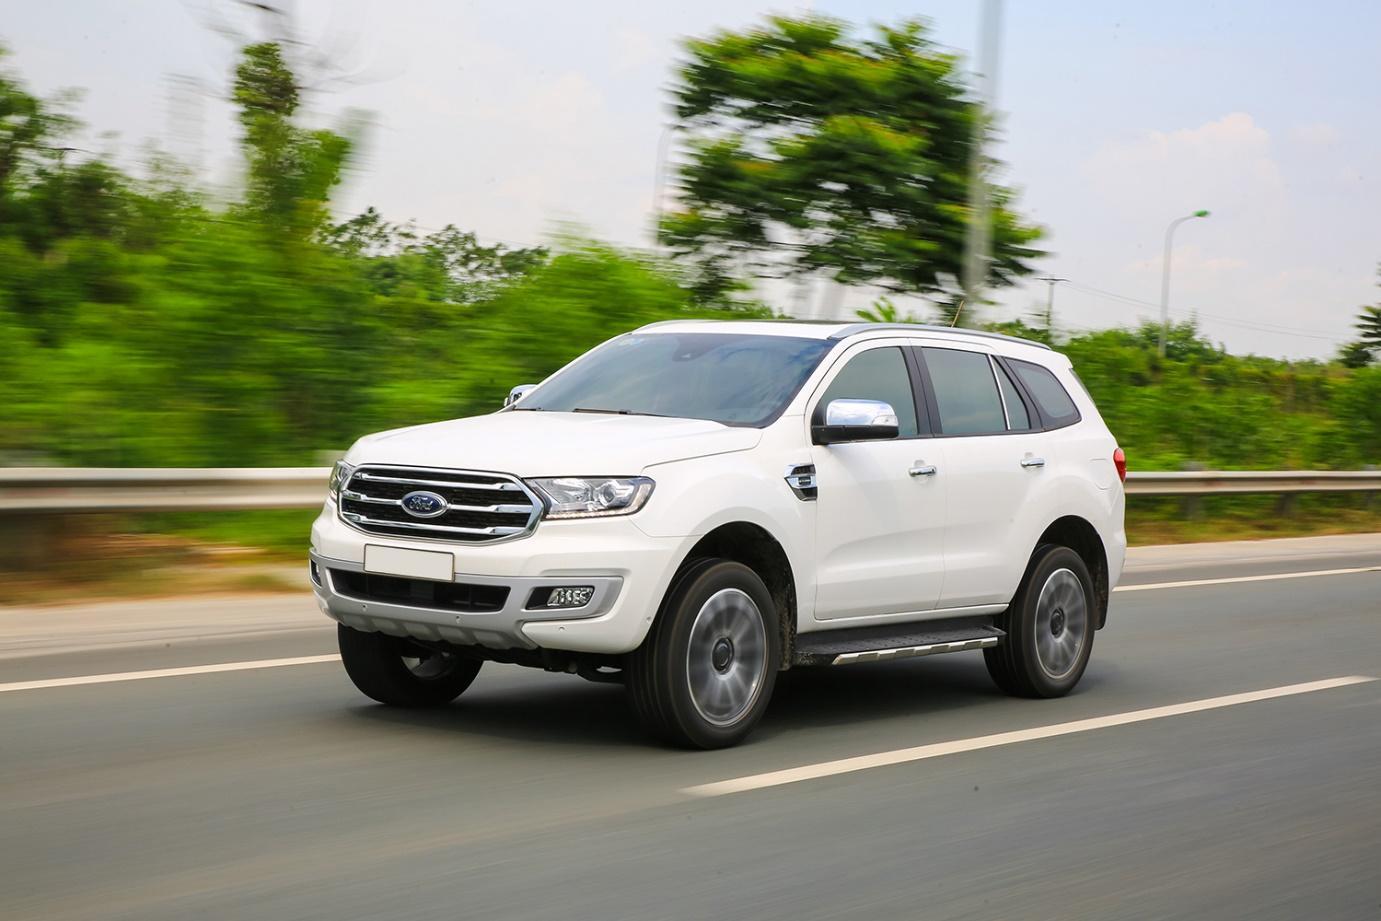 Image result for kinh nghiệm sử dụng Ford Everest 2019